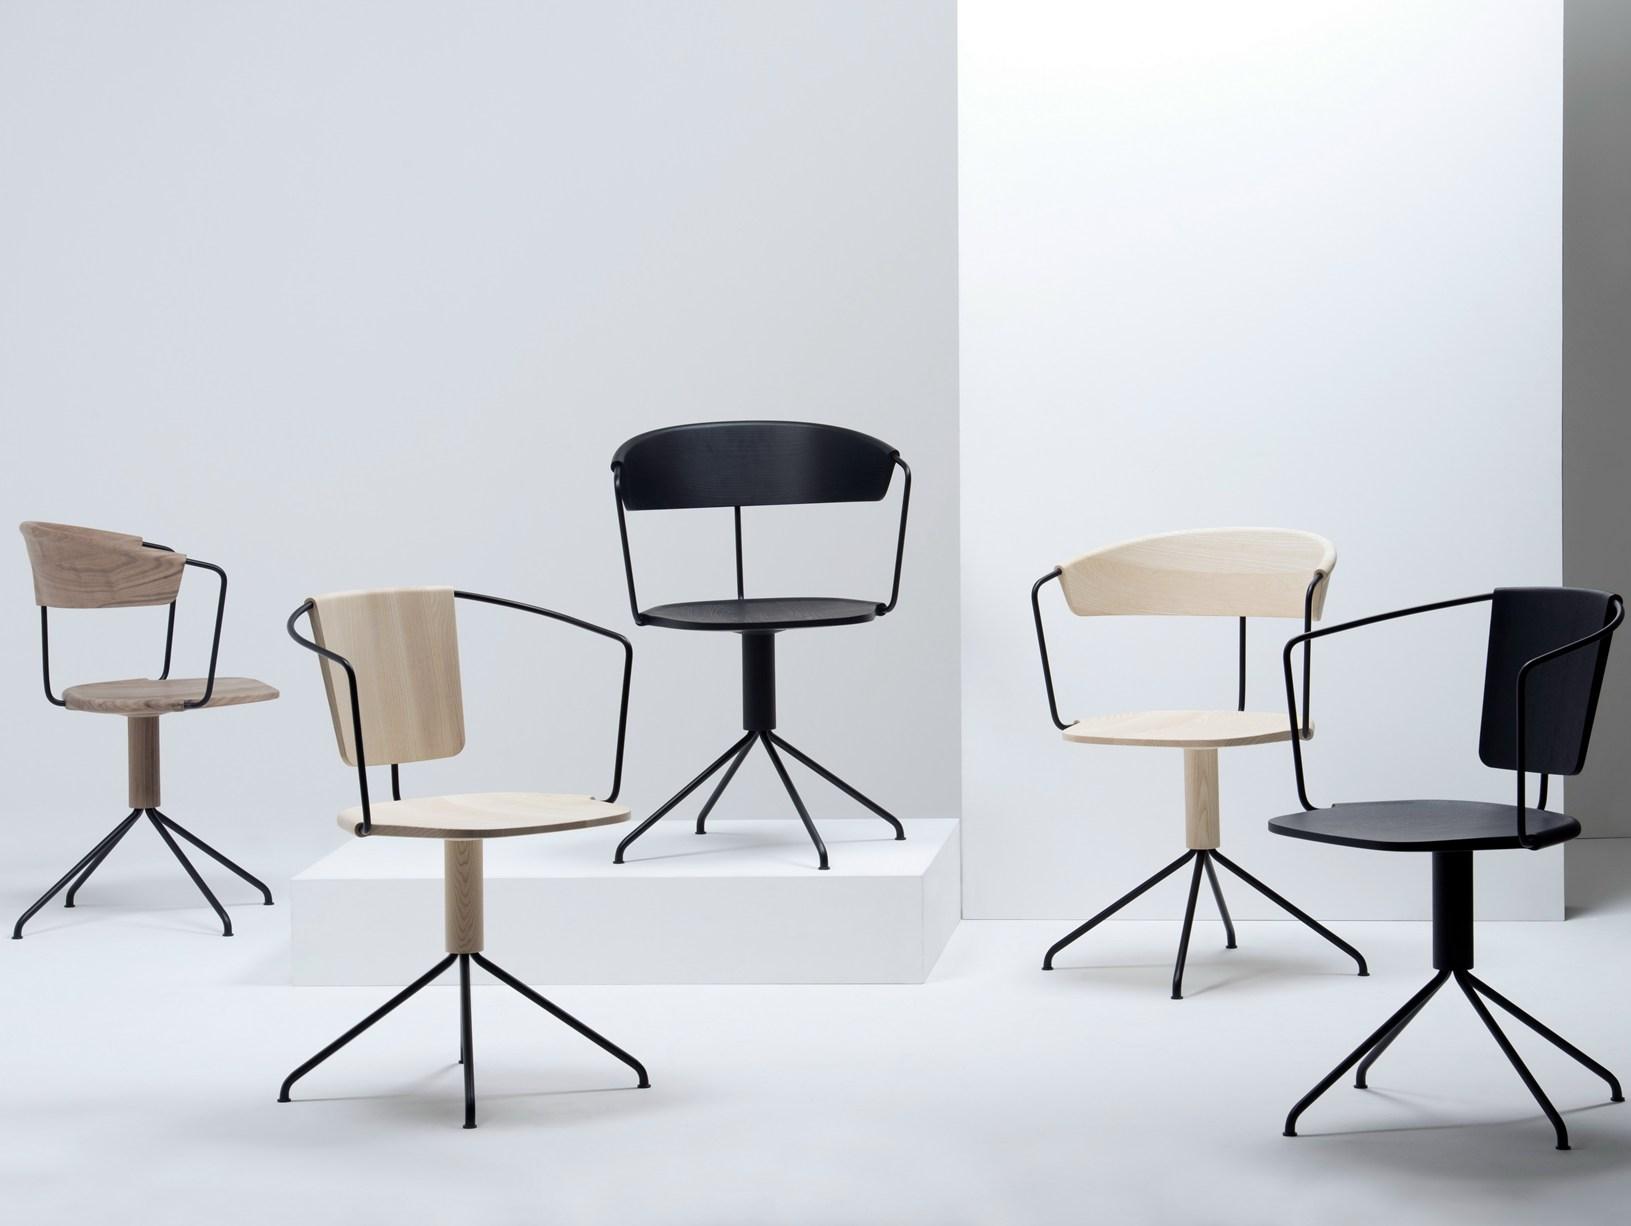 uncino design by ronan erwan bouroullec. Black Bedroom Furniture Sets. Home Design Ideas